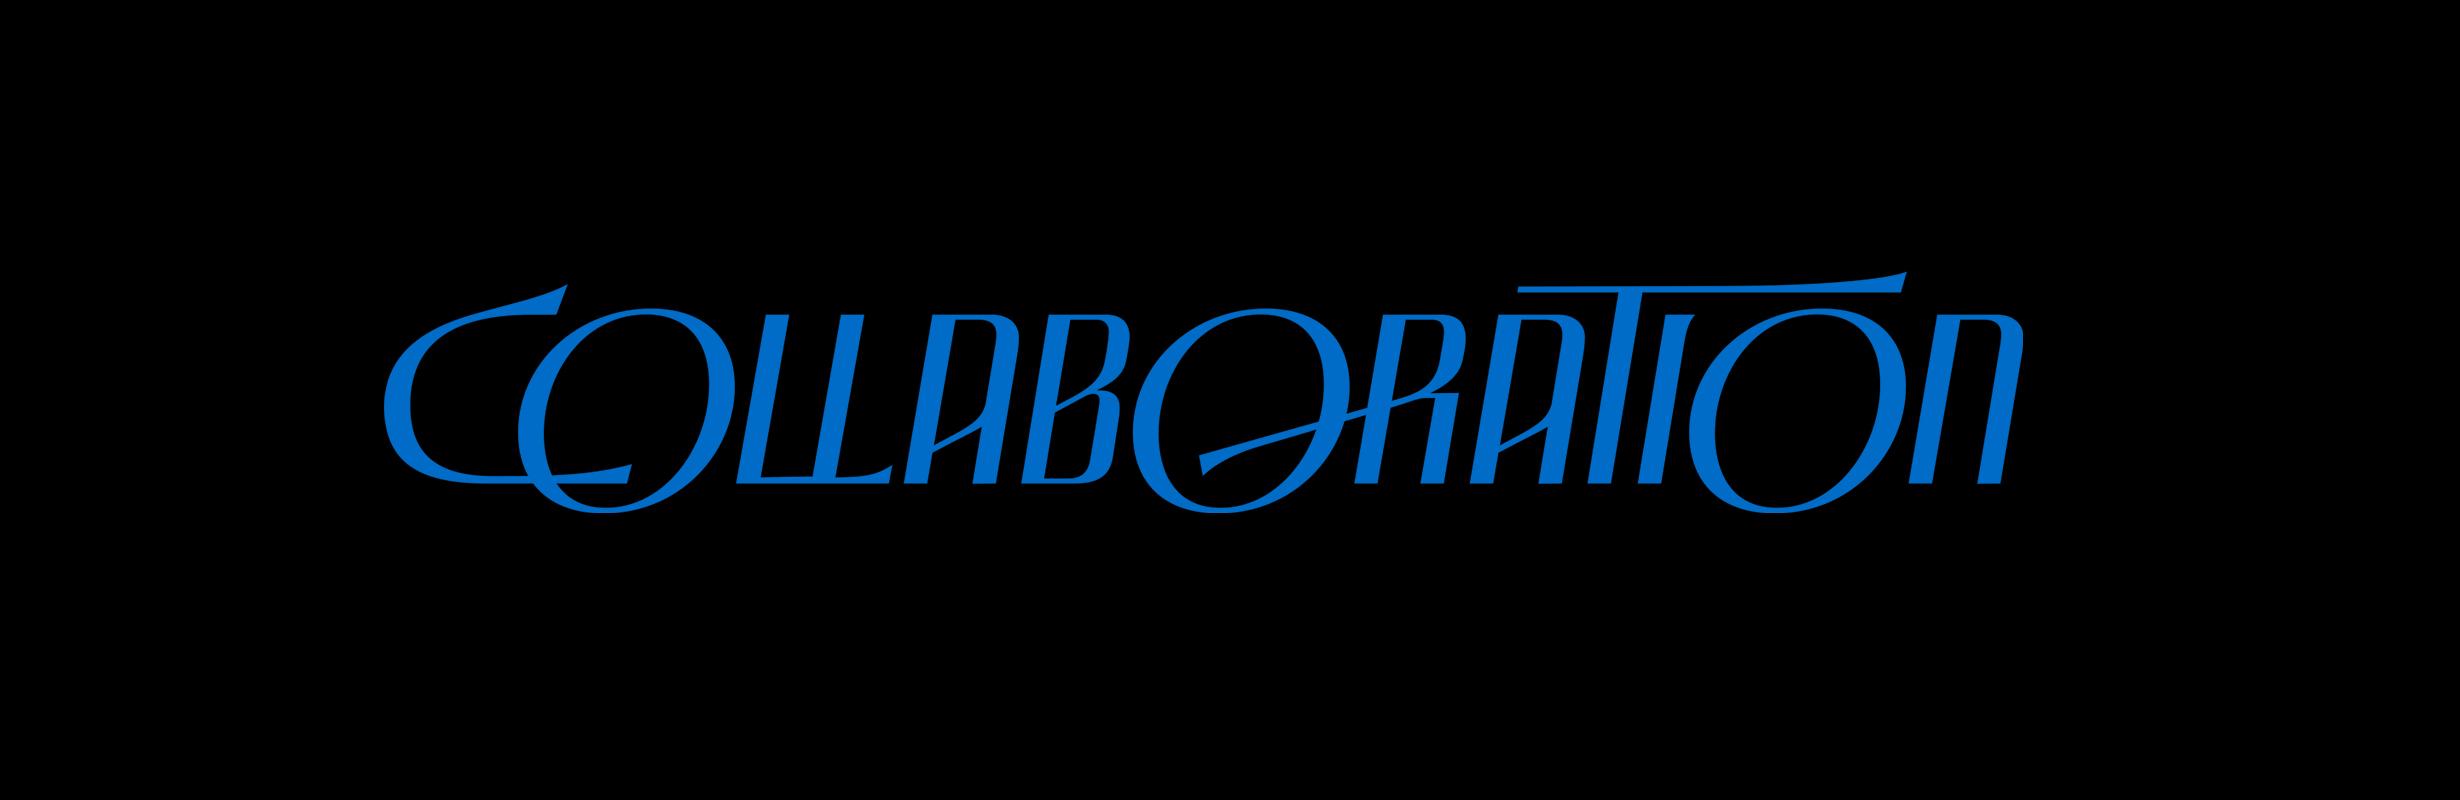 rbma_collab_full-.jpg